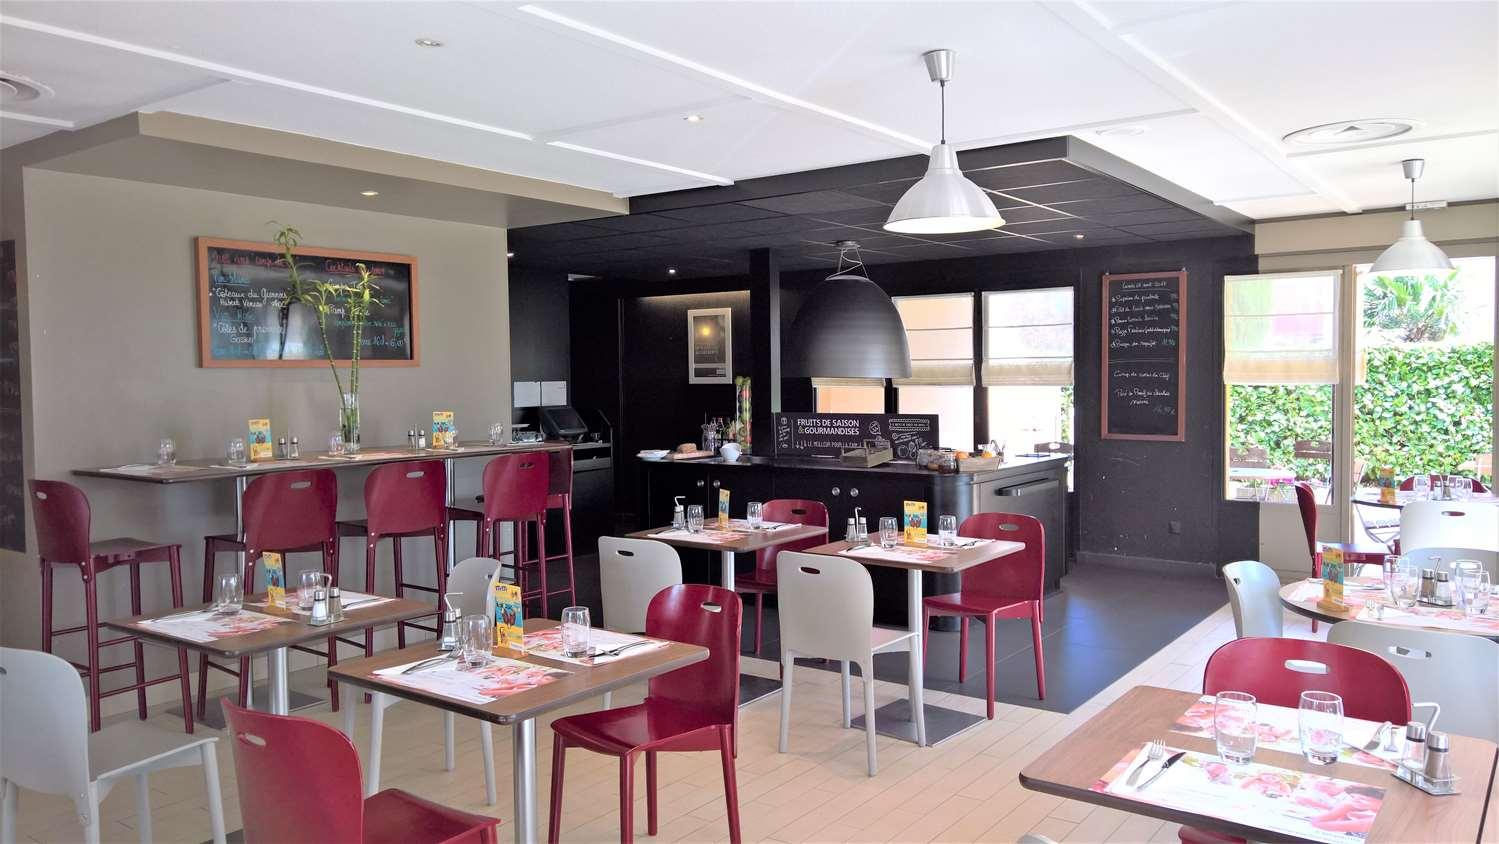 Restaurant - Hotel Campanile Nevers Nord - Varennes Vauzelles